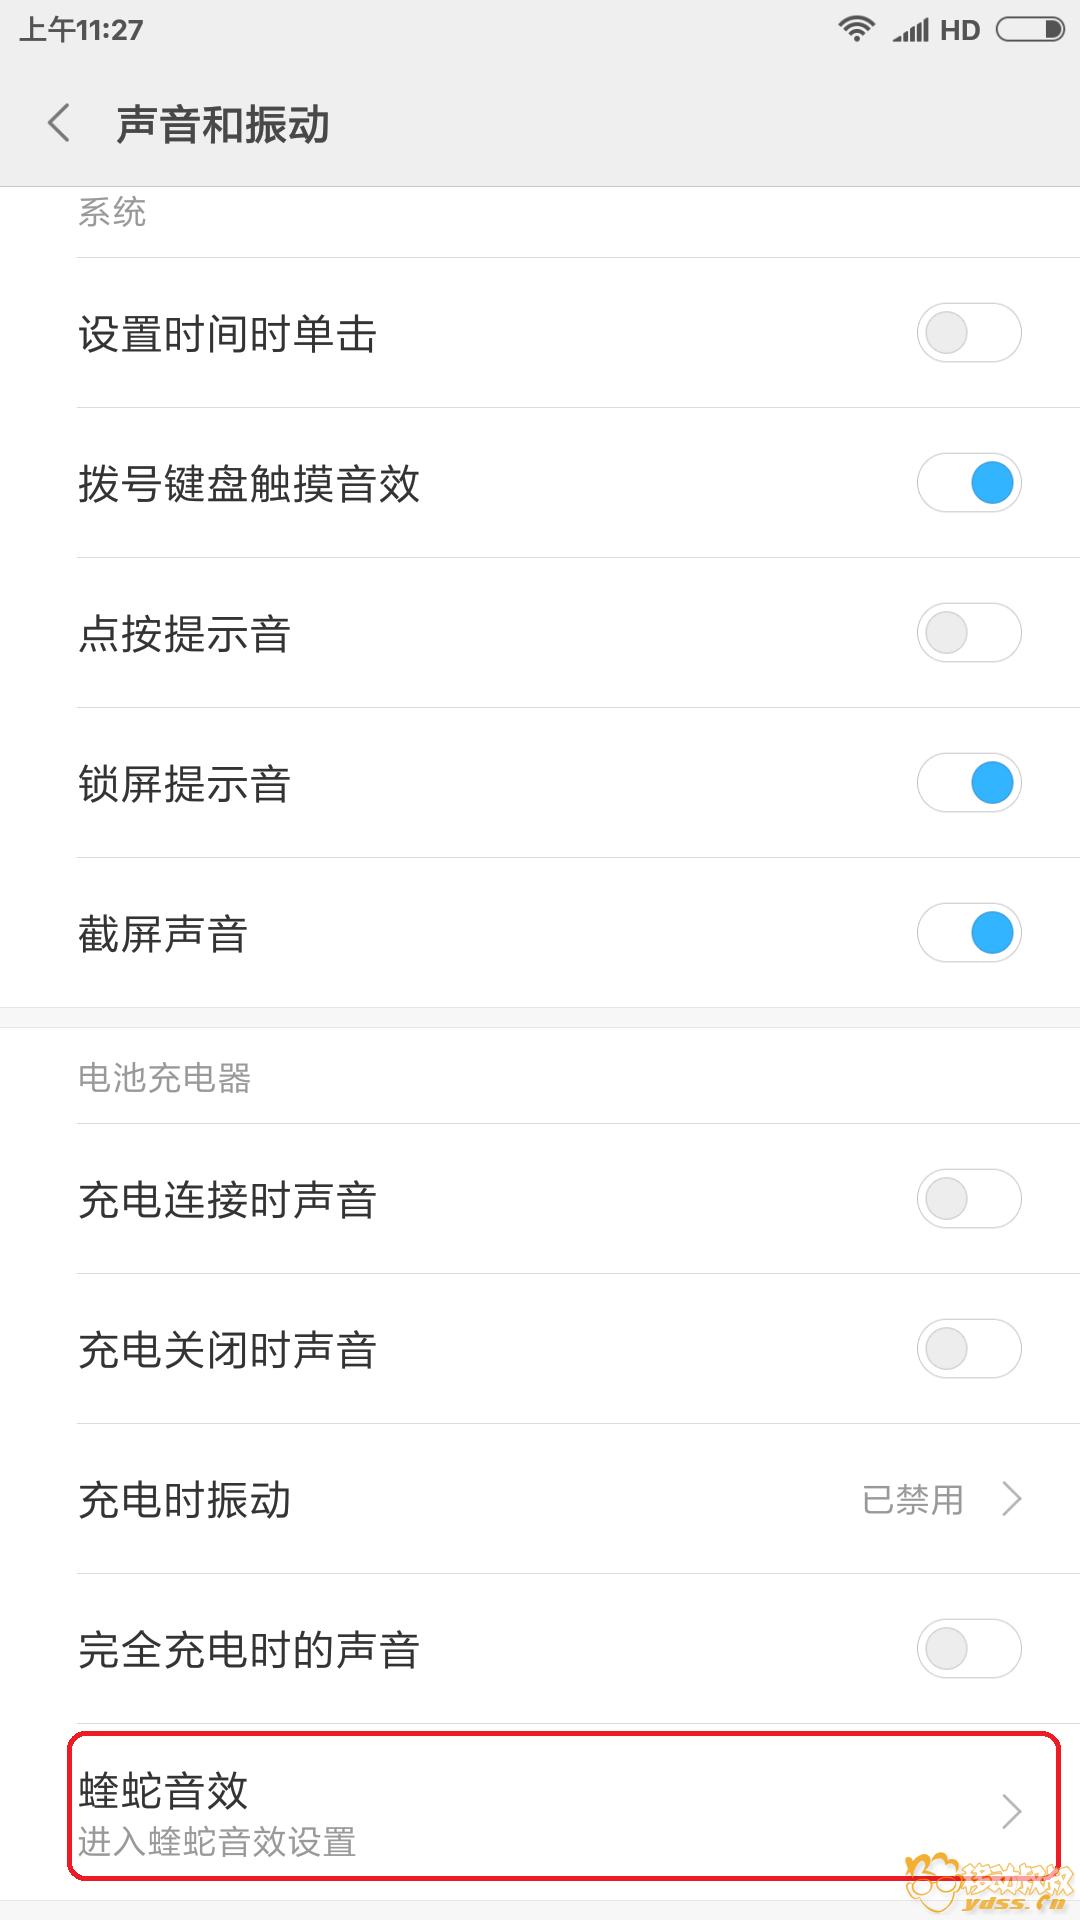 Screenshot_2018-05-04-11-27-45-457_com.android.settings.png